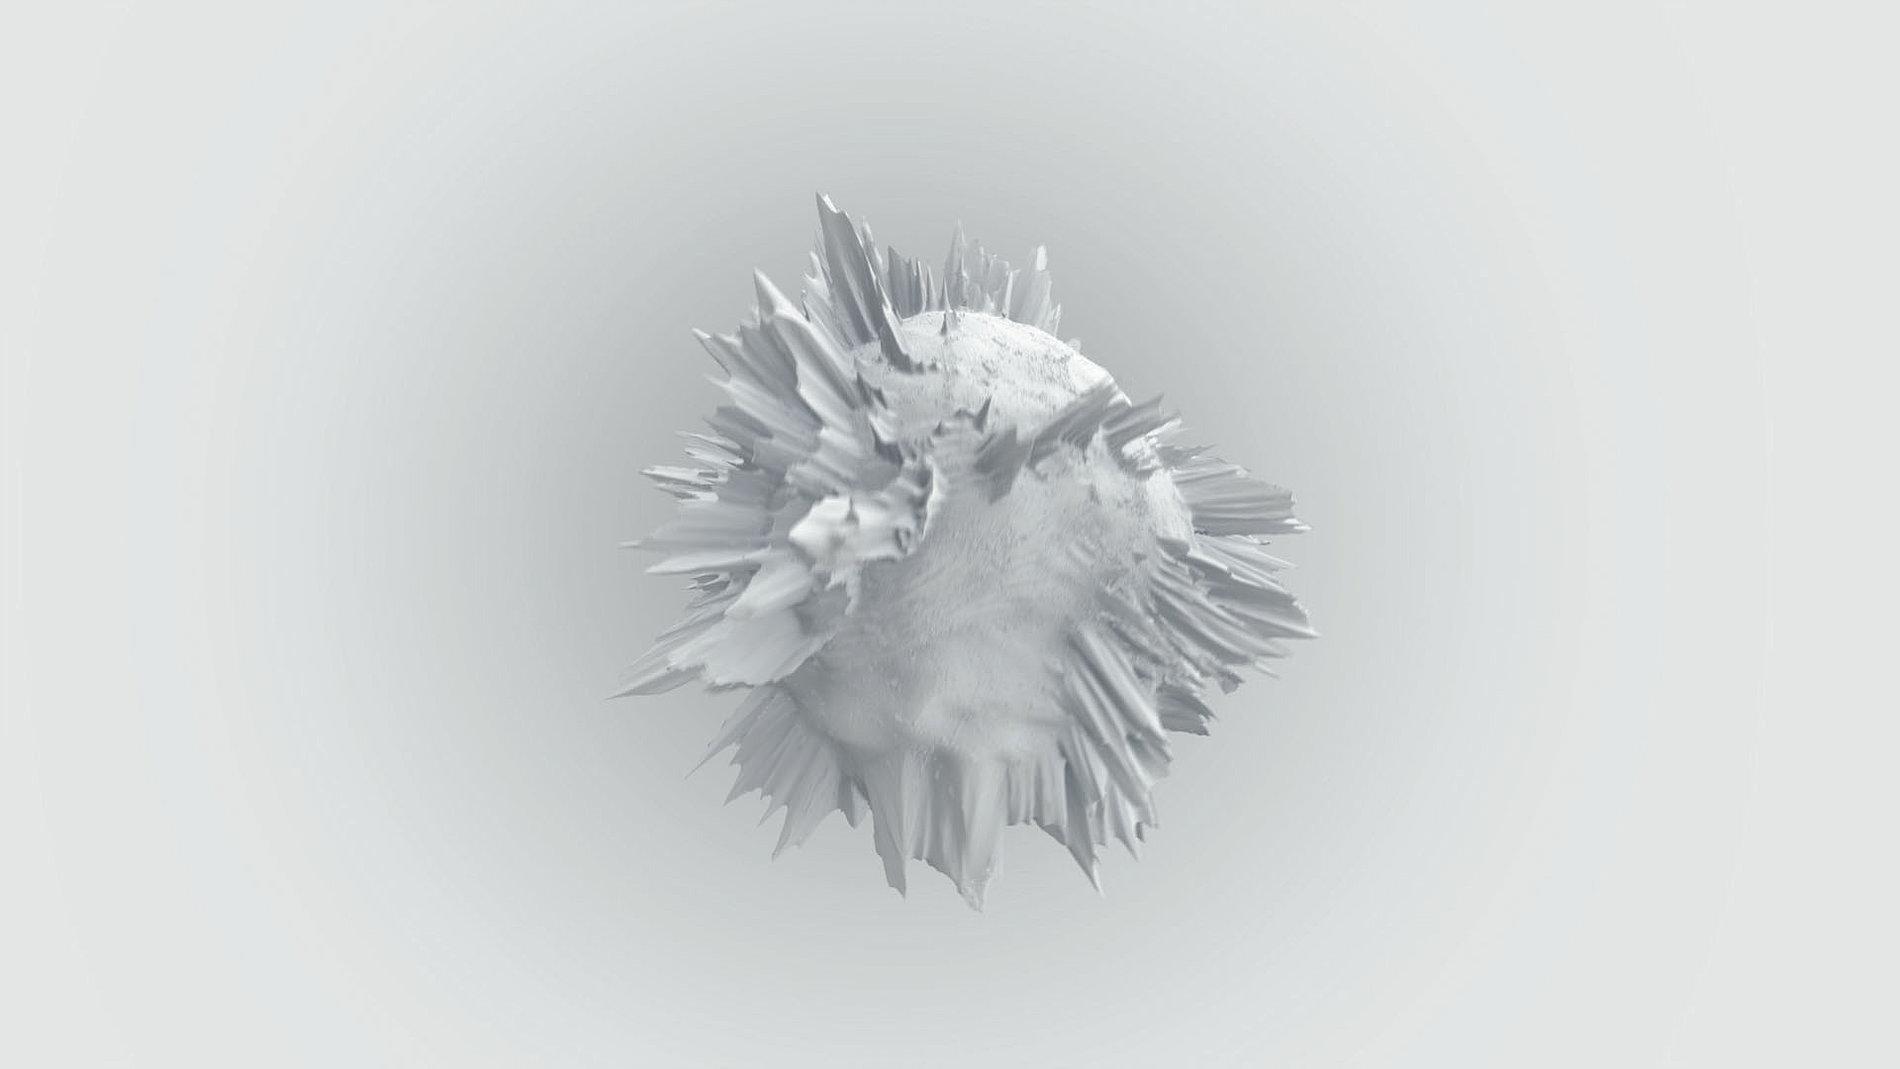 """Pass on the change"" – The change manifesto | Red Dot Design Award"